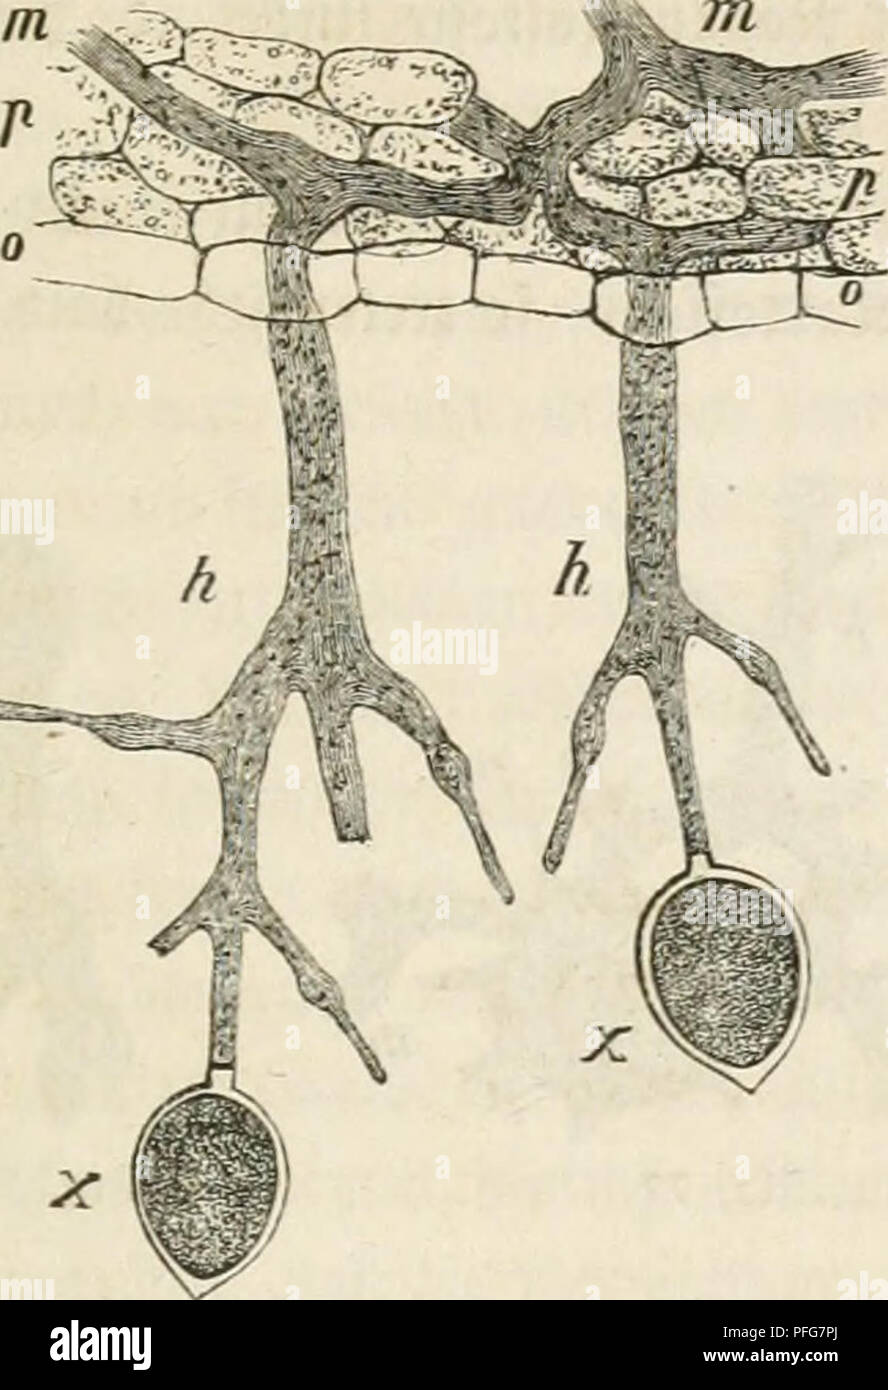 . Das Mikroskop; ein Mittel der Belehrung und Unterhaltung für Jedermann sowie des Gewinns für Biese. Microscope and microscopy. in ben 33lättcnt bei Äartcffdu. 217 weiter ipäcf)ft o luii: 4,, fid) üer^irctgt mir ^,mn 9Jh)ceüum rer fünftigen i^flan^^c entancfelt. I)er 3nf)a(t tcö Äehnbläöc^ene u>an= bevt ta6ei aUnuif^ücf) in ten Ä'eim]cf)(auc6, [c tap in jenem junäcf)]'! P. Please note that these images are extracted from scanned page images that may have been digitally enhanced for readability - coloration and appearance of these illustrations may not perfectly resemble the original work.. - Stock Image